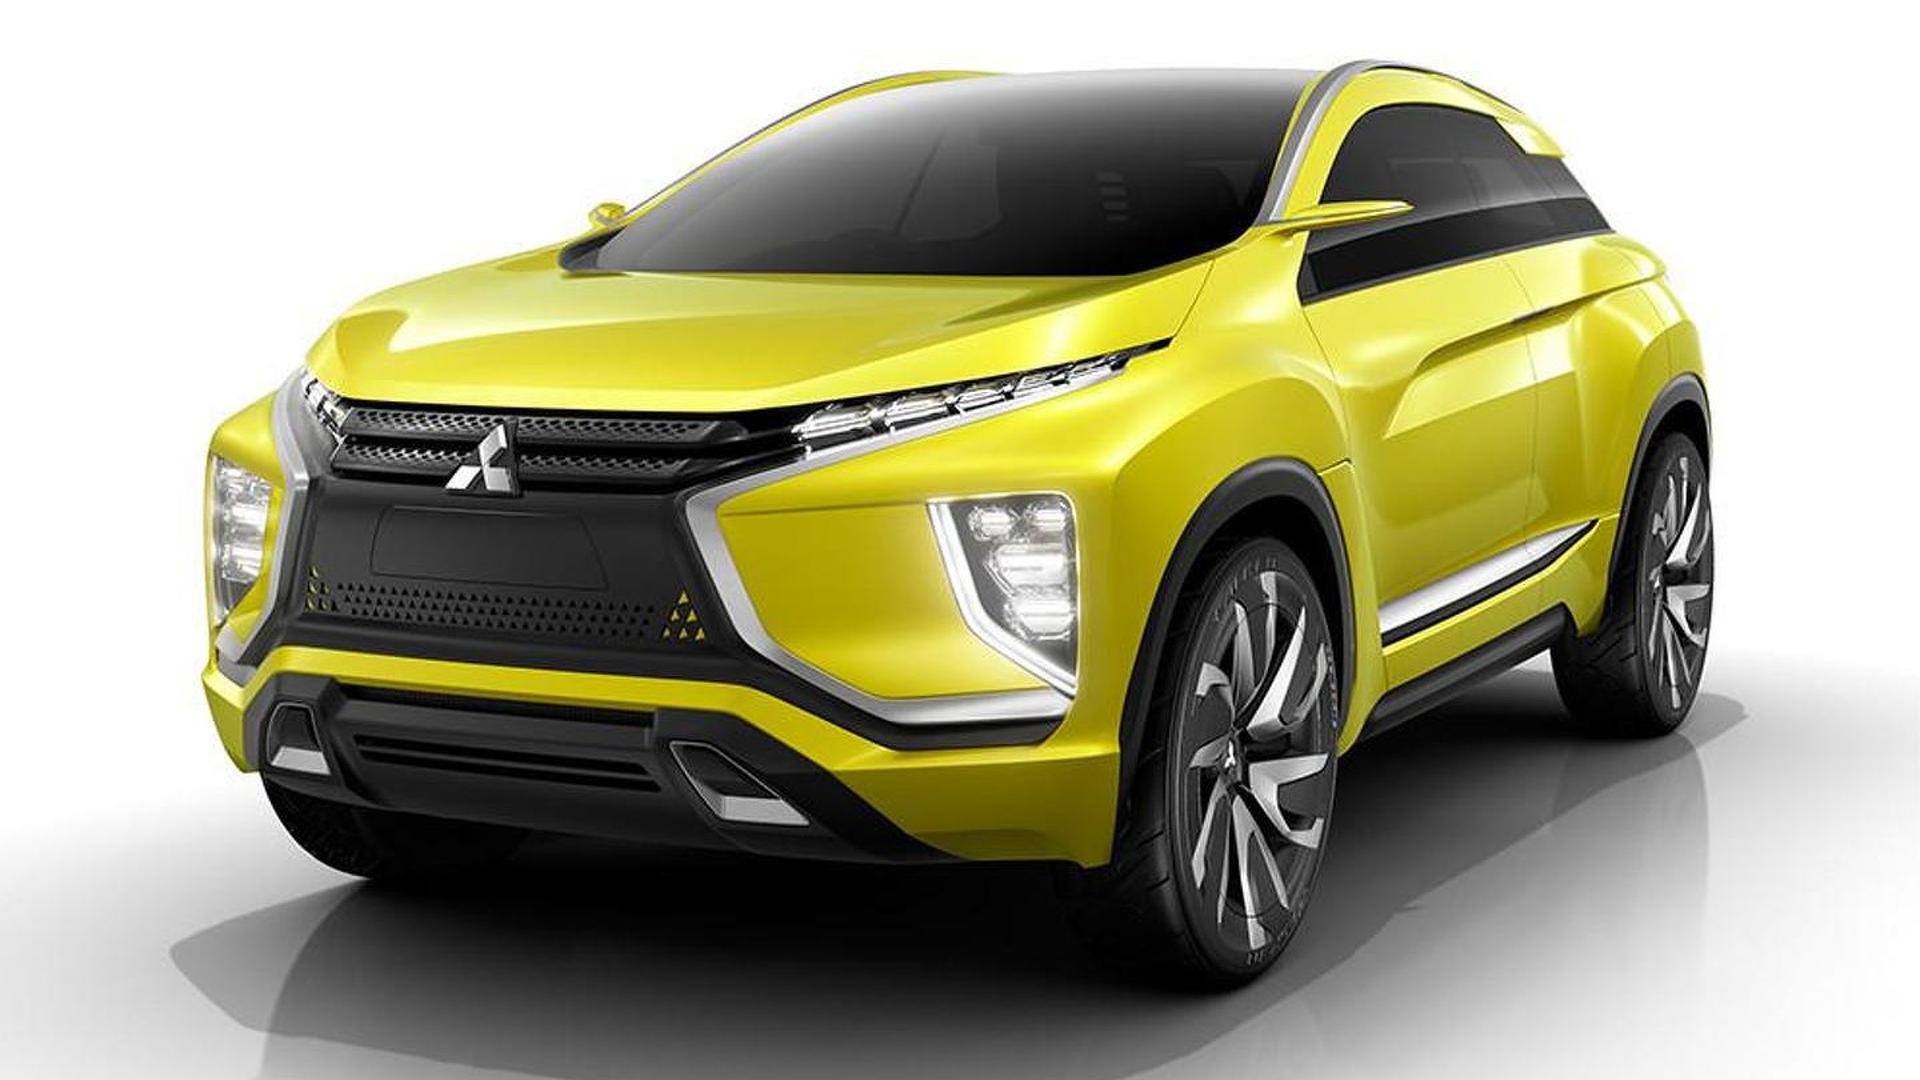 2020 Mitsubishi small electric SUV to have 400 km range, says CEO